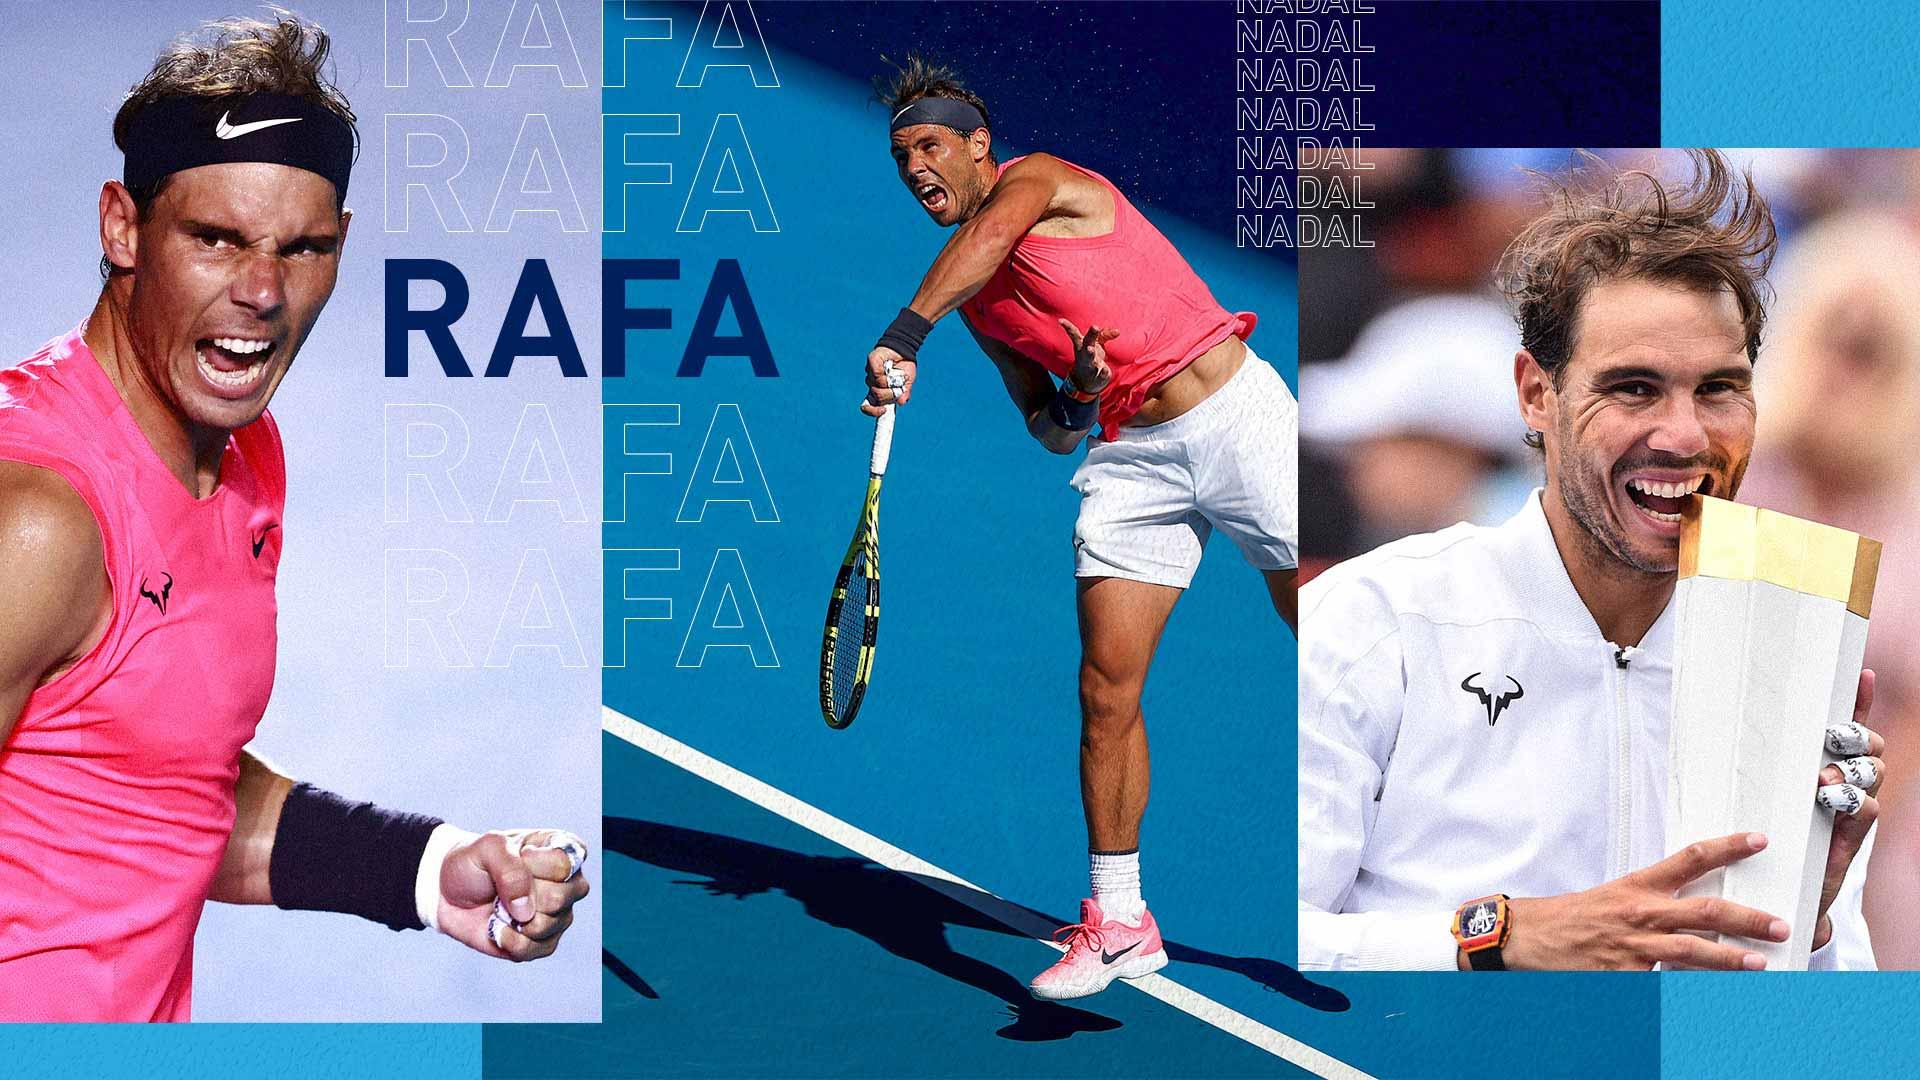 34 Stats On Rafael Nadal S 34th Birthday Atp Tour The Union Journal